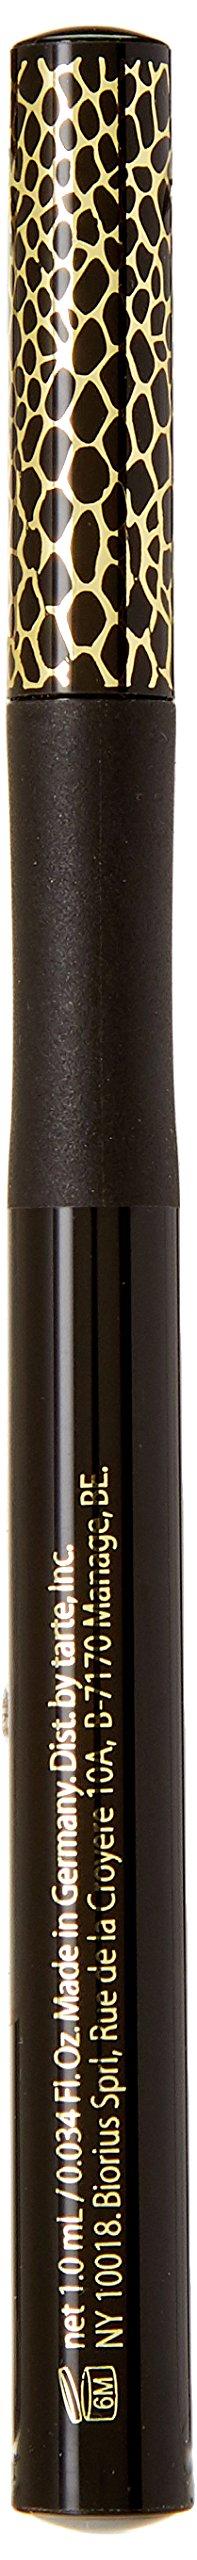 tarte Lights, Camera Lashes Precision Longwear Eyeliner in Black 0.034 FL OZ by Tarte (Image #4)